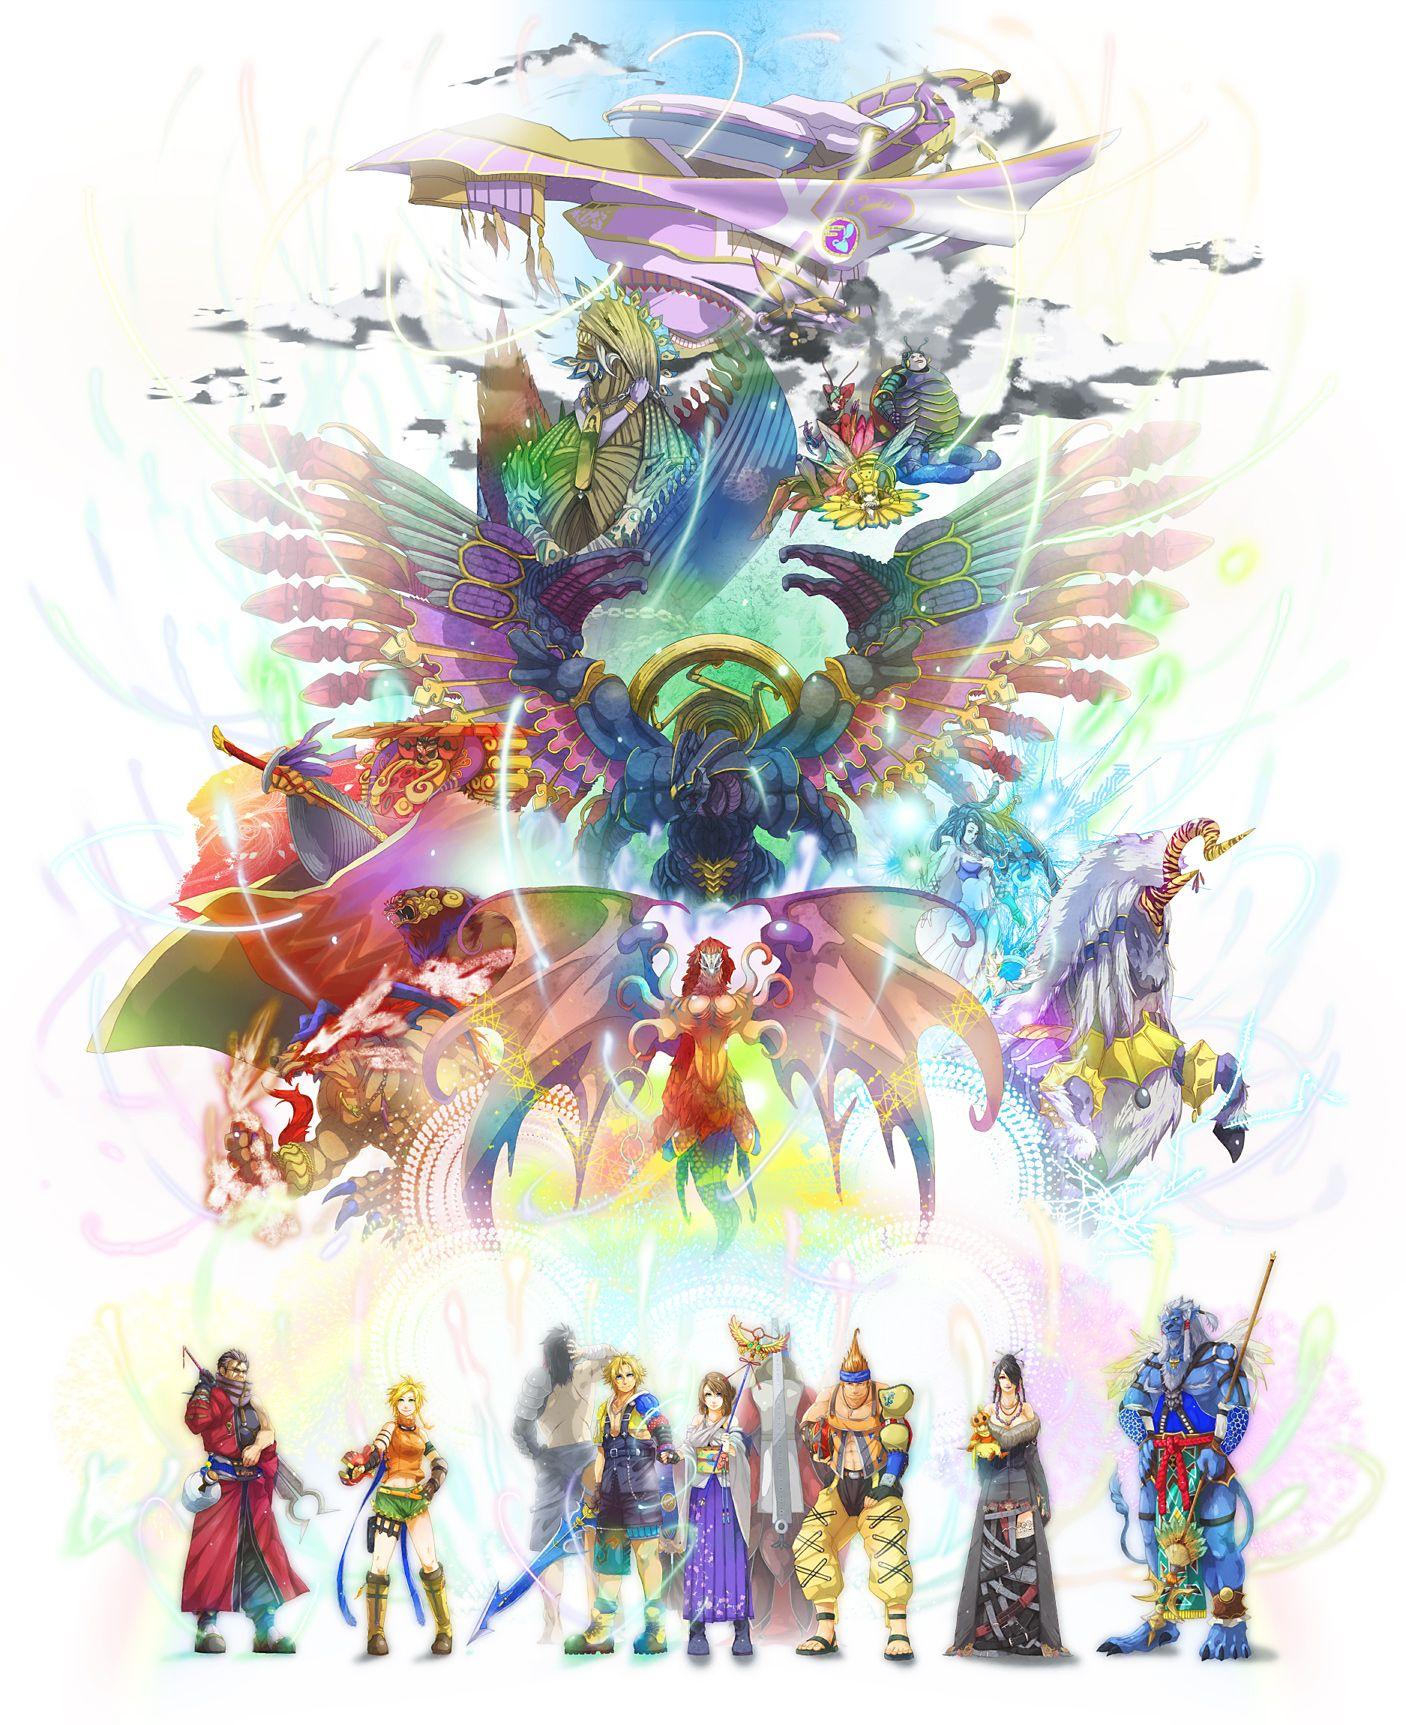 Pin By Sarah Golden On Final Fantasy Final Fantasy X Final Fantasy Artwork Final Fantasy